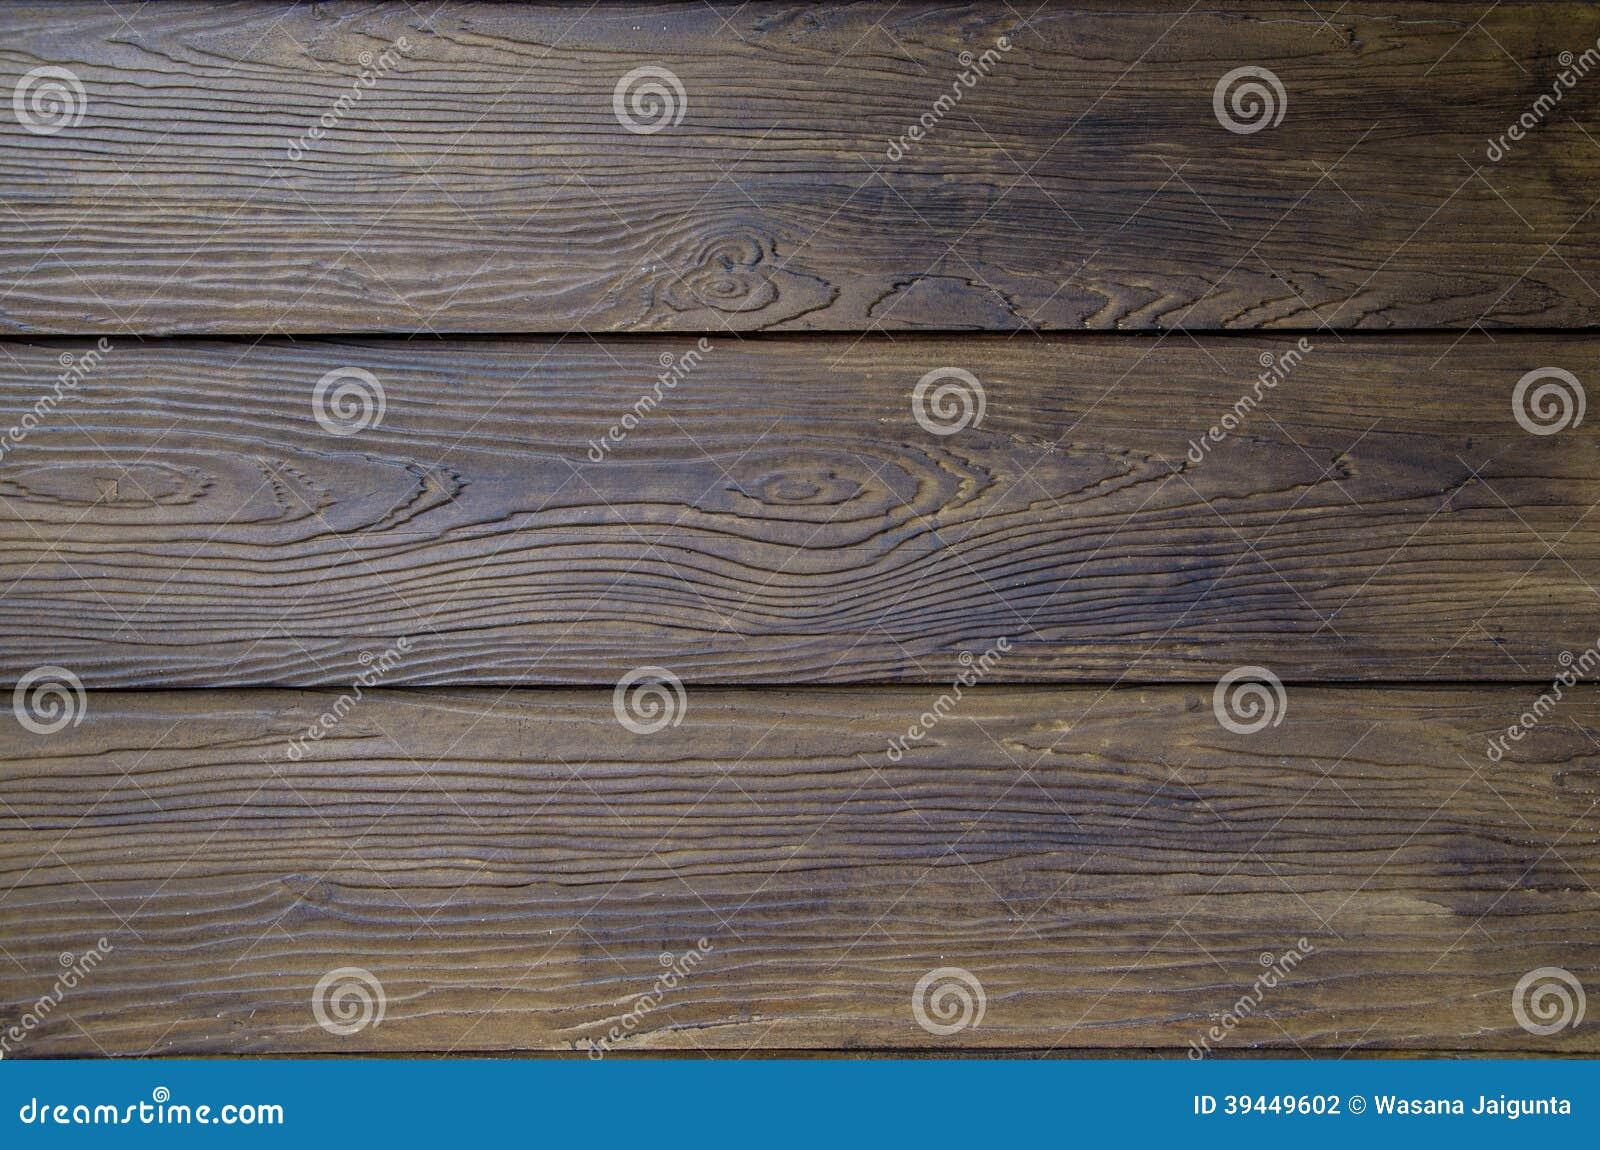 Shera Wood Stock Photo Image 39449602